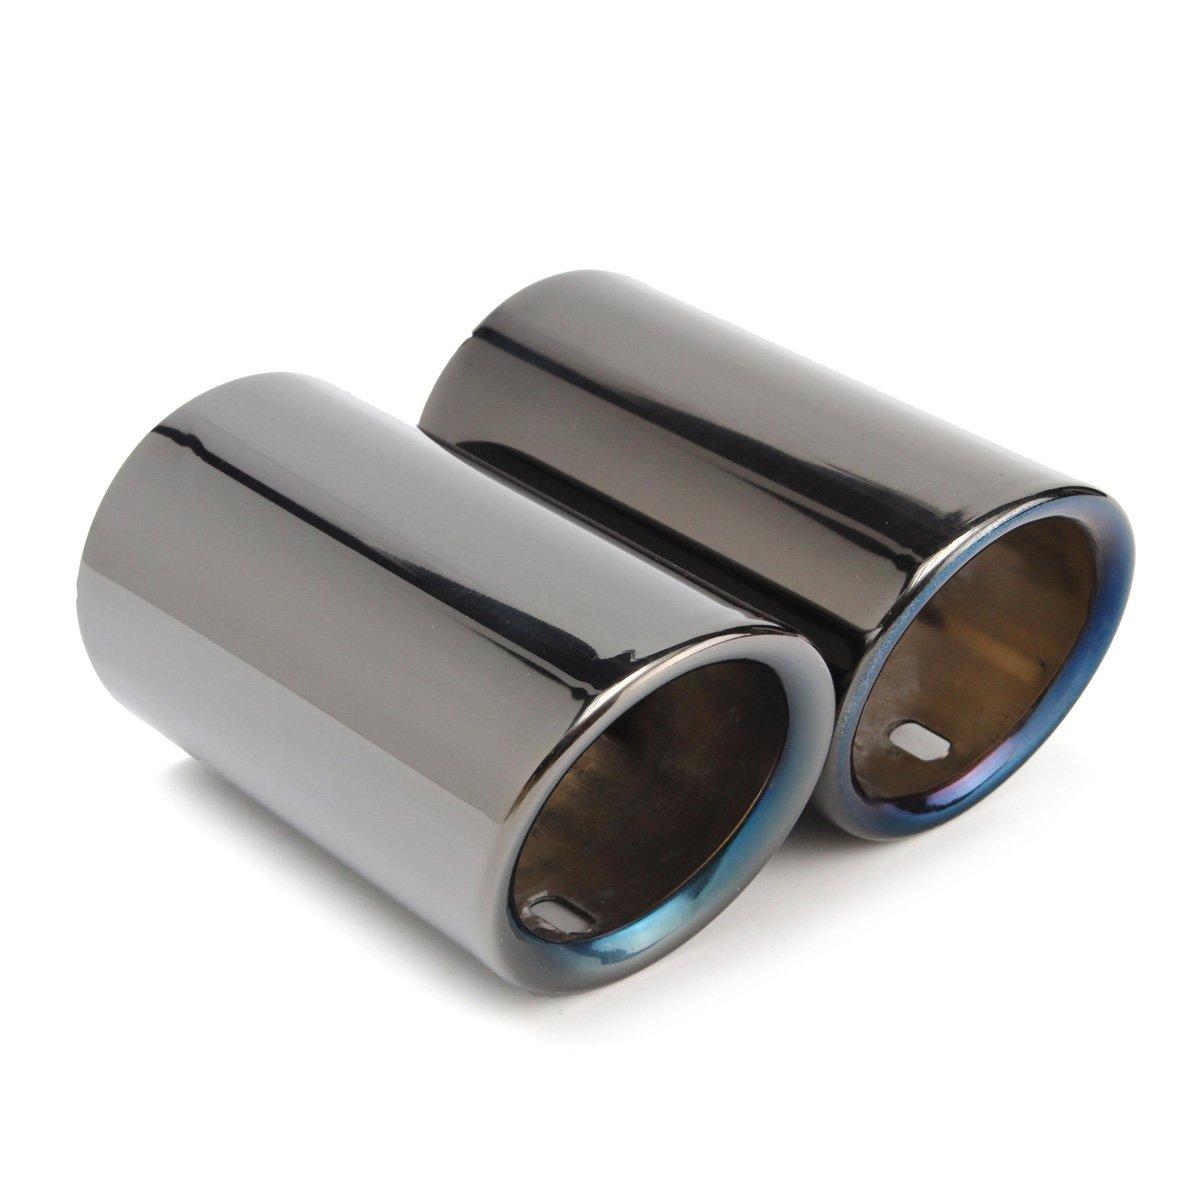 FidgetKute 2pcs Titanium Black Muffler Exhaust Tail Pipe Tip for BMW E90 E92 325 325i 328i